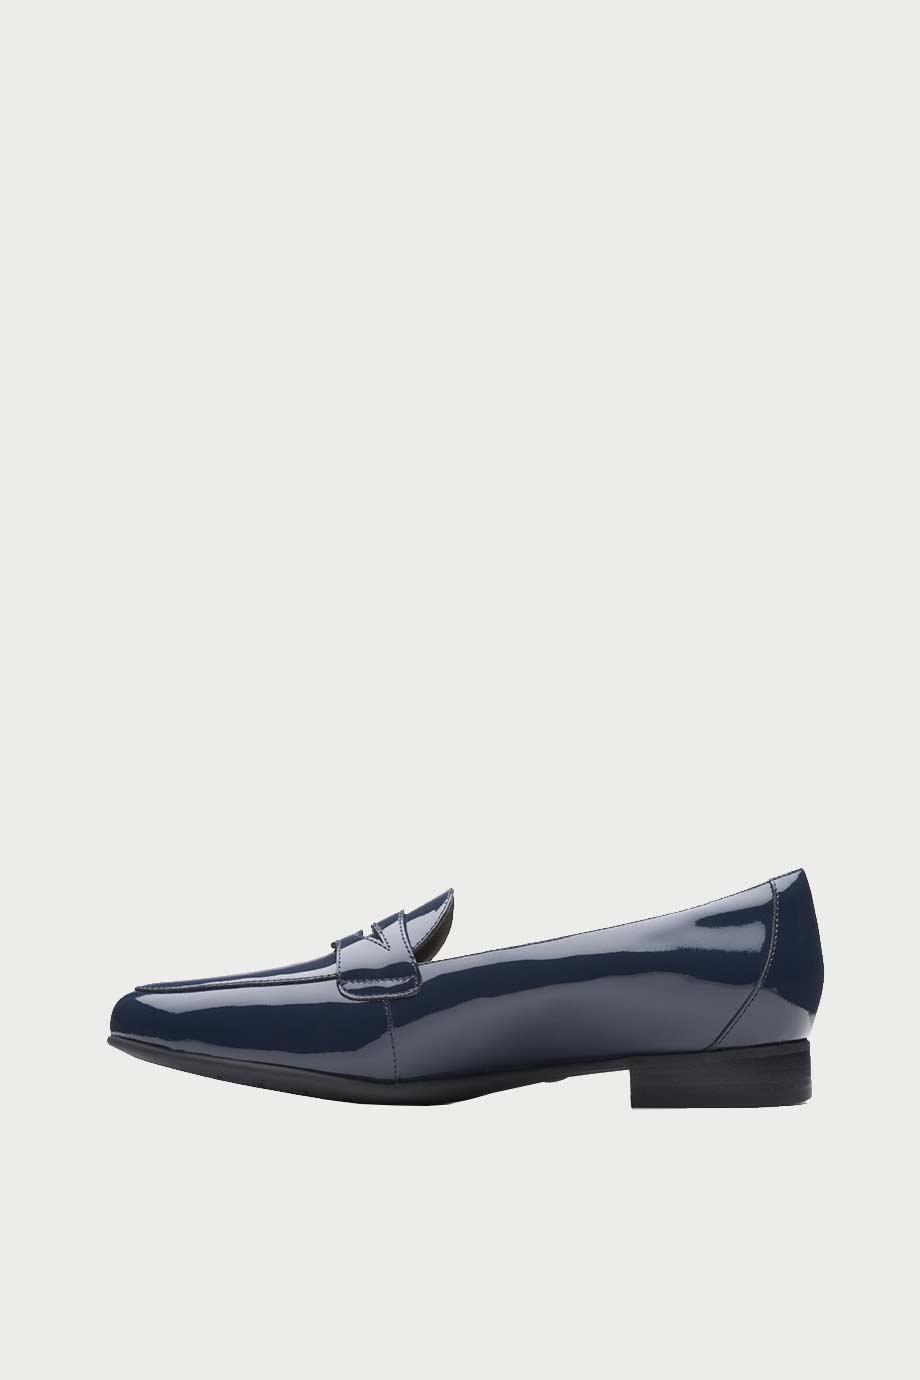 spiridoula metheniti shoes xalkida p un blush go clarks navy patent 5 1